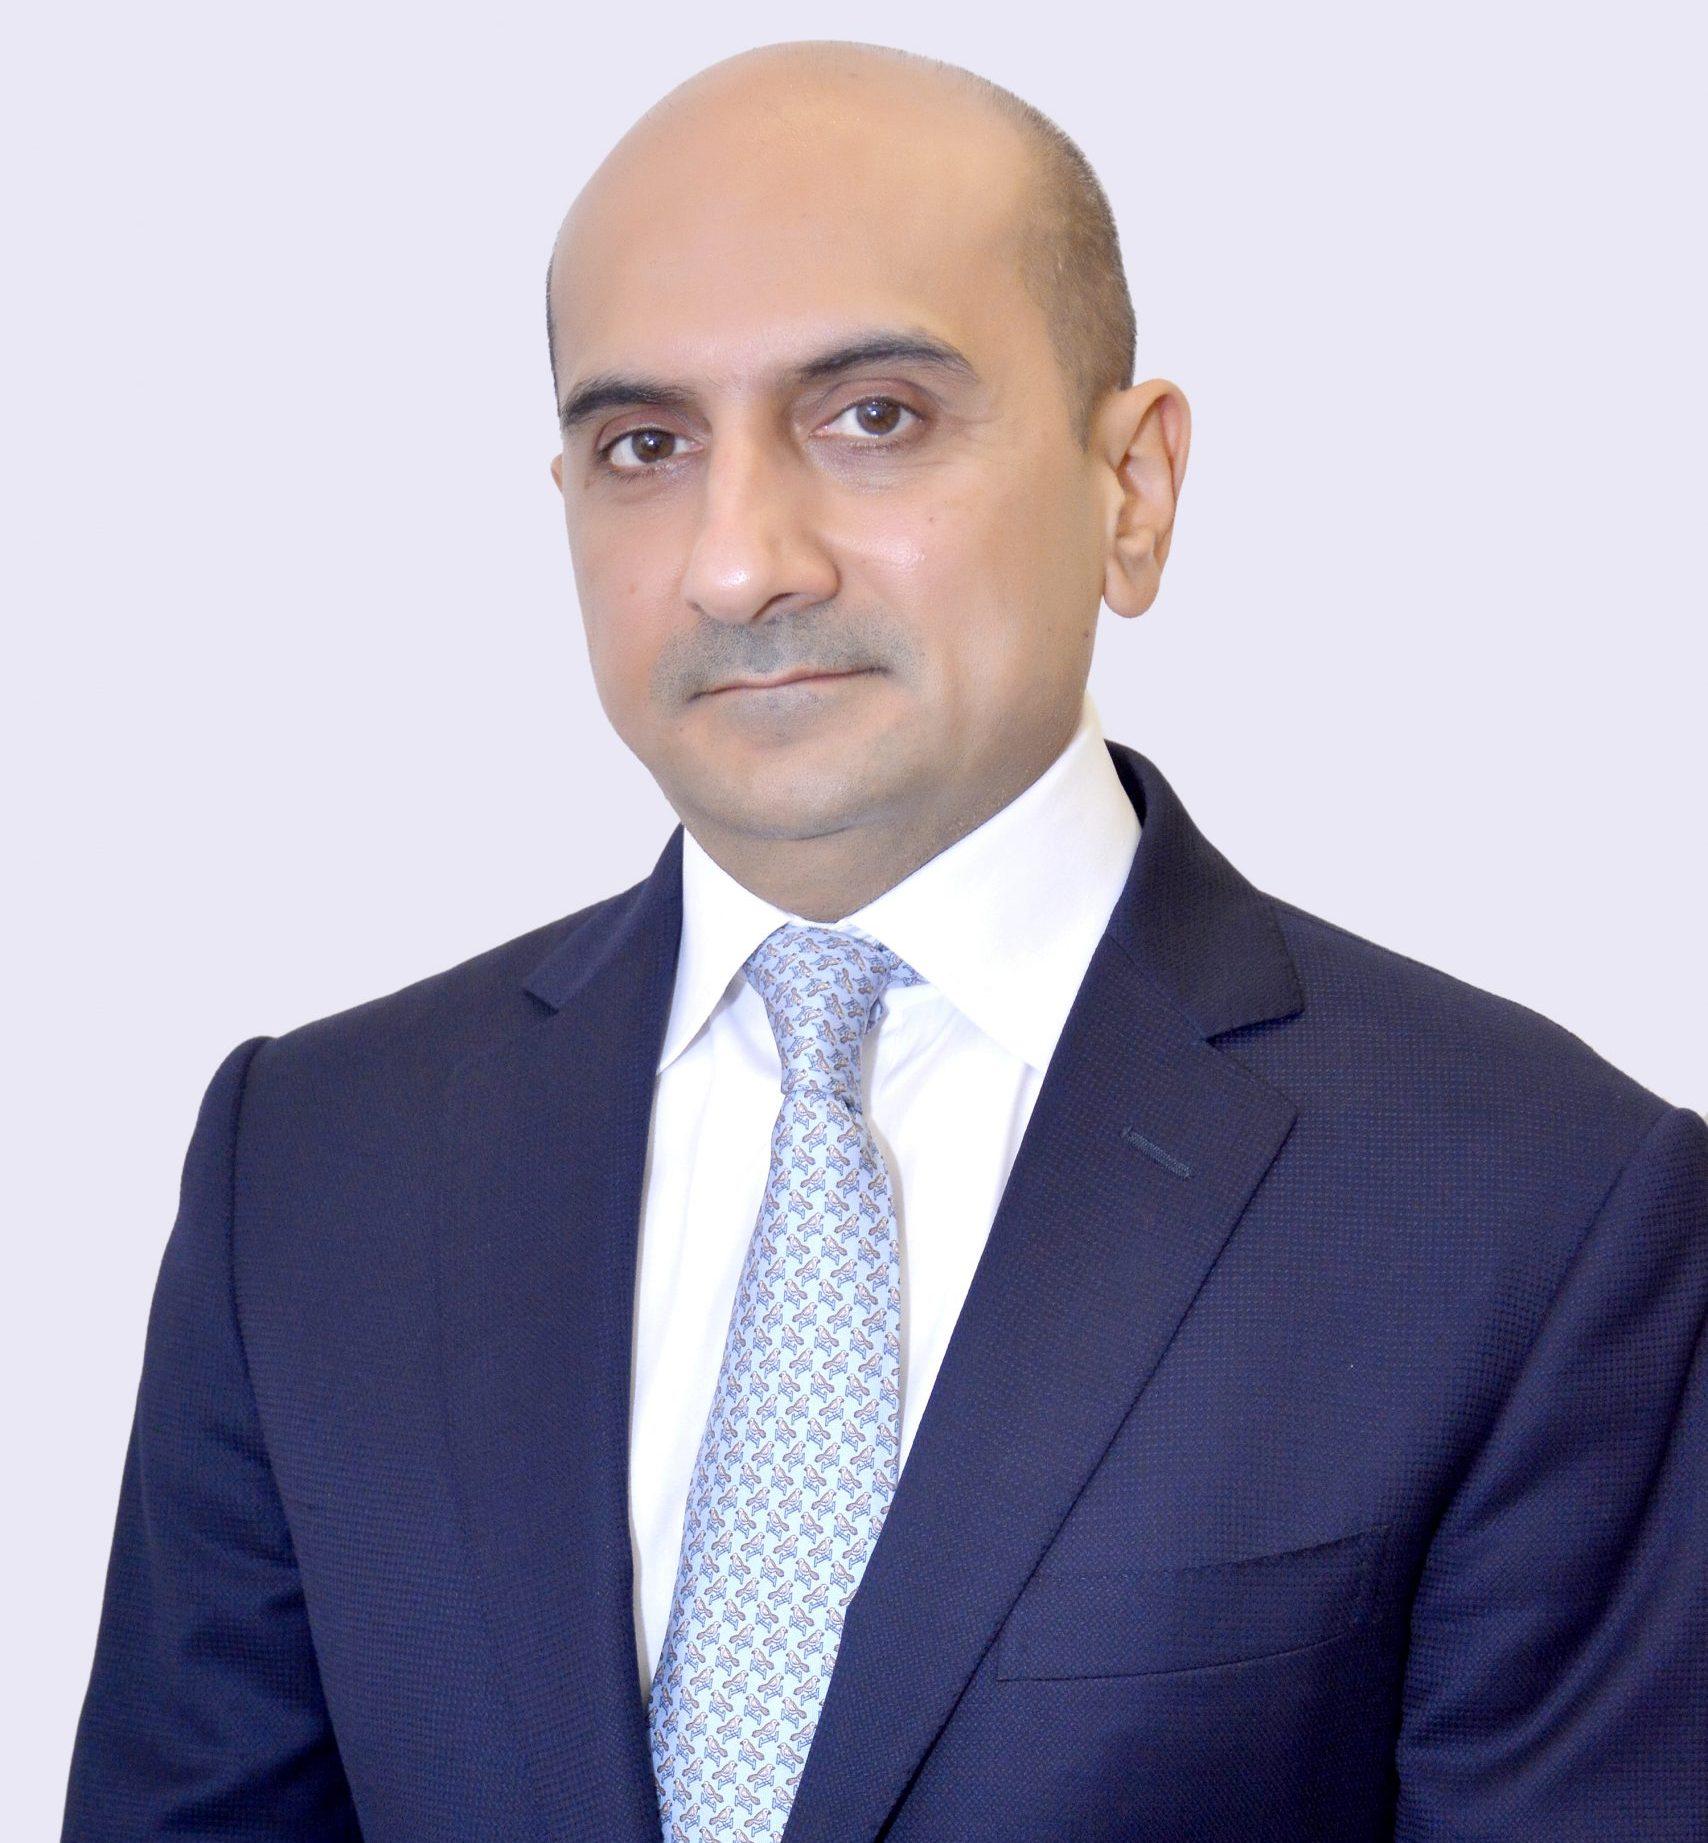 Mr. Gaurav Sekhri - Director, Fratelli Wines